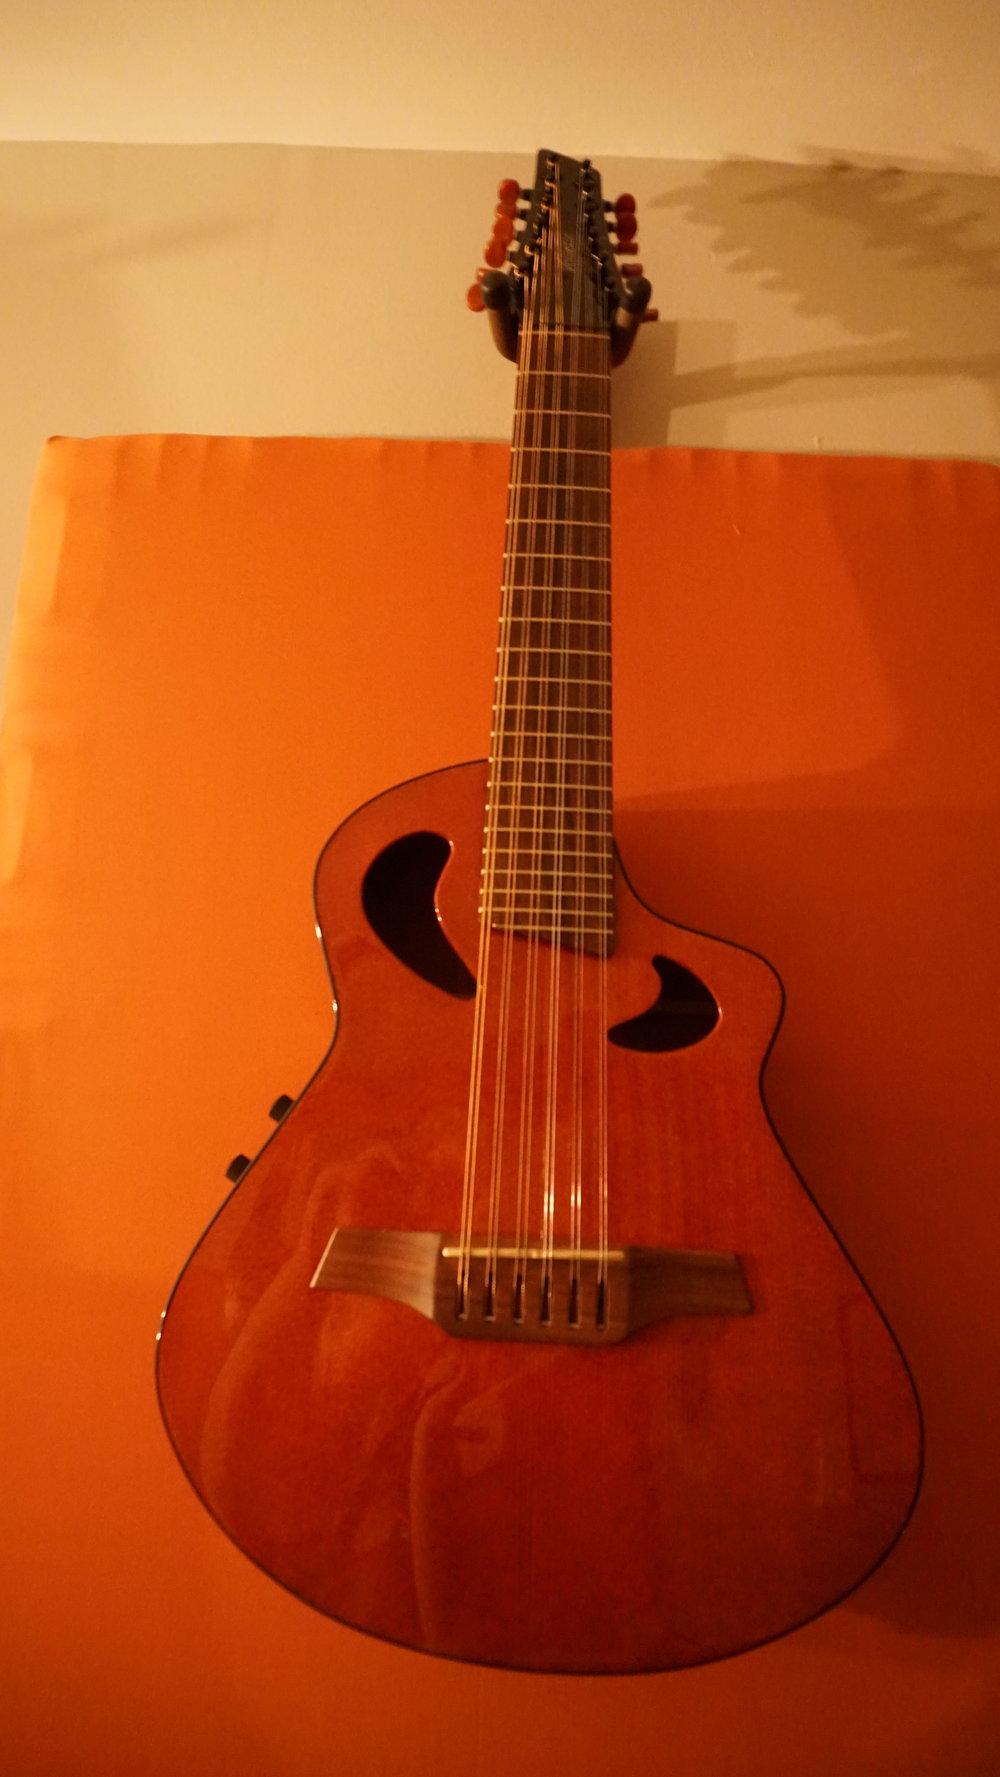 Veillette Gryphon 12 string